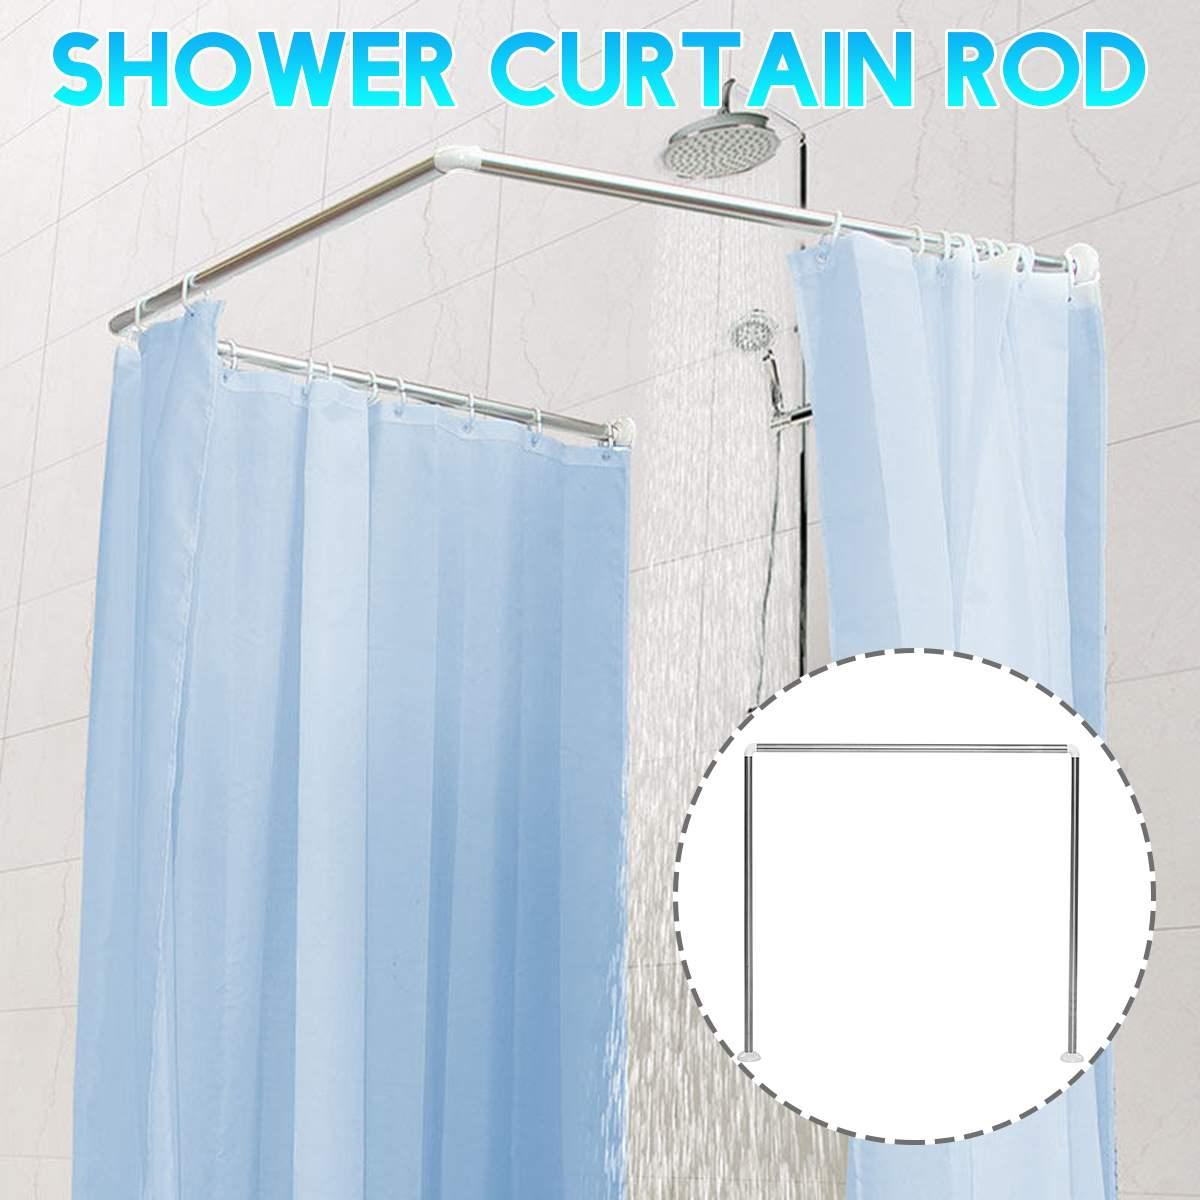 Stainless Steel/Aluminum Alloy L/U Shape Adjustable Bathroom Shower Curtain Rods Curved Rail Rod Bathroom Bar Up to 20KG Bearing